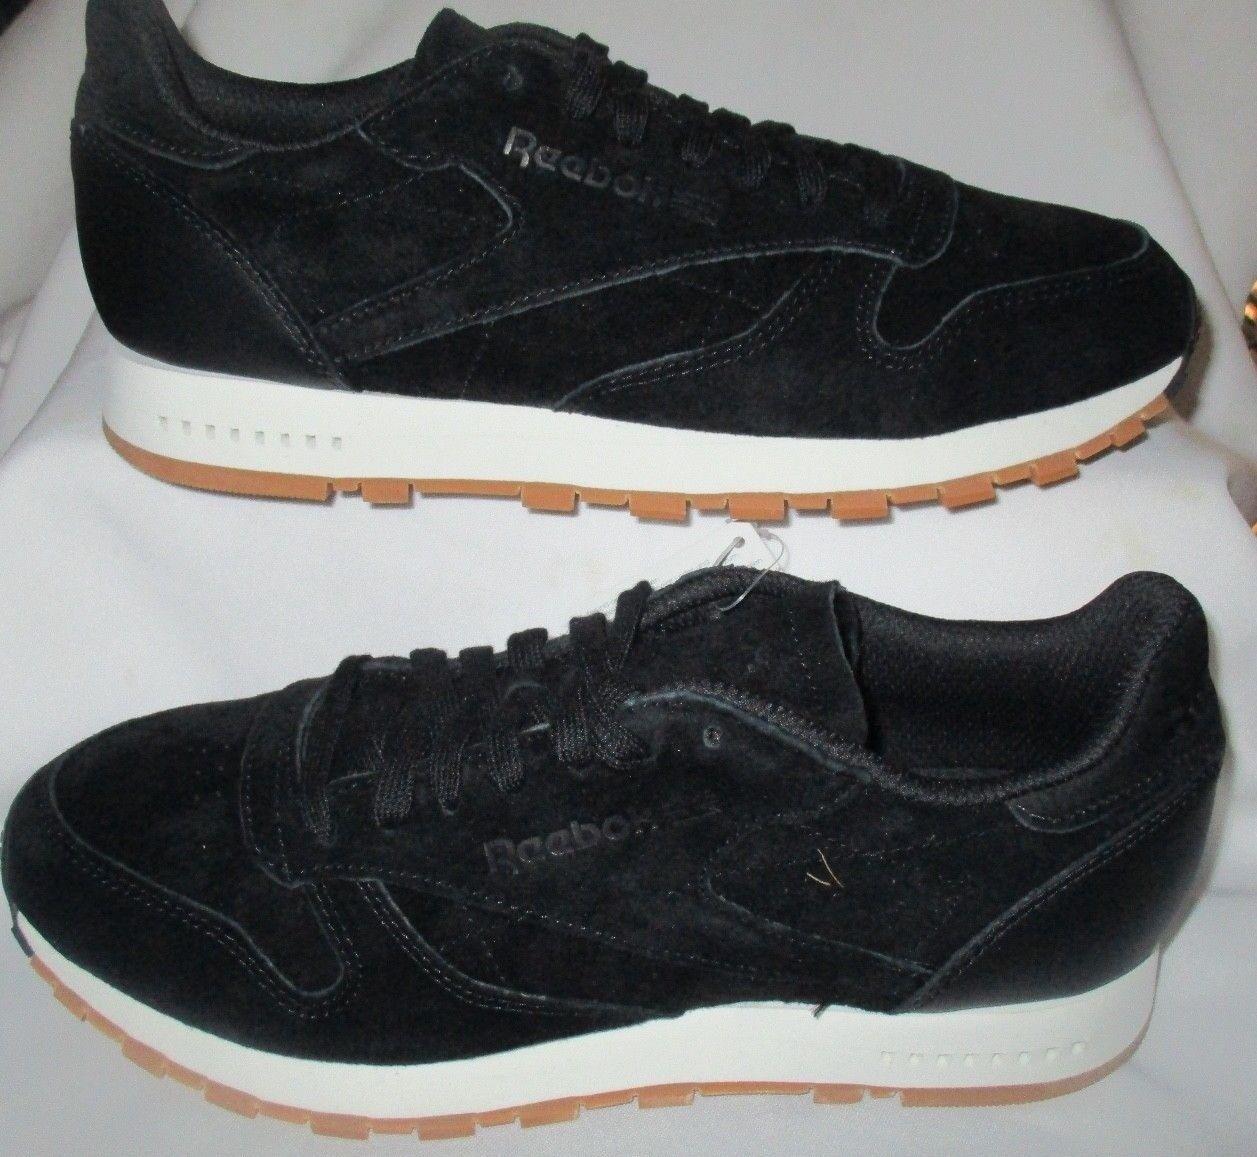 hommes REEBOK CLASSIC CL LEATHER SG noir /CHALK-GUM Chaussures SIZE 8